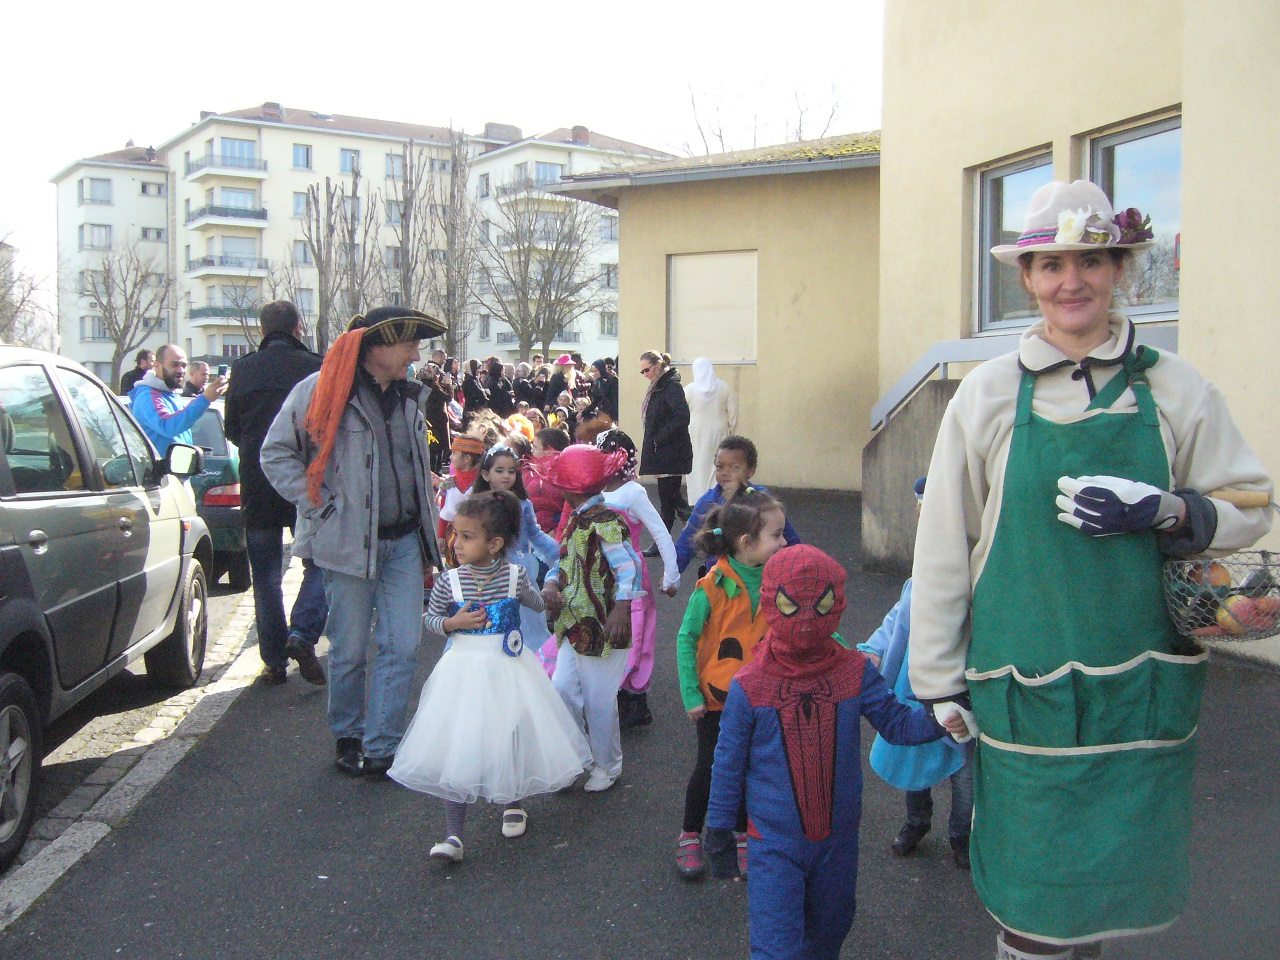 carnaval bonthoux 002.JPG